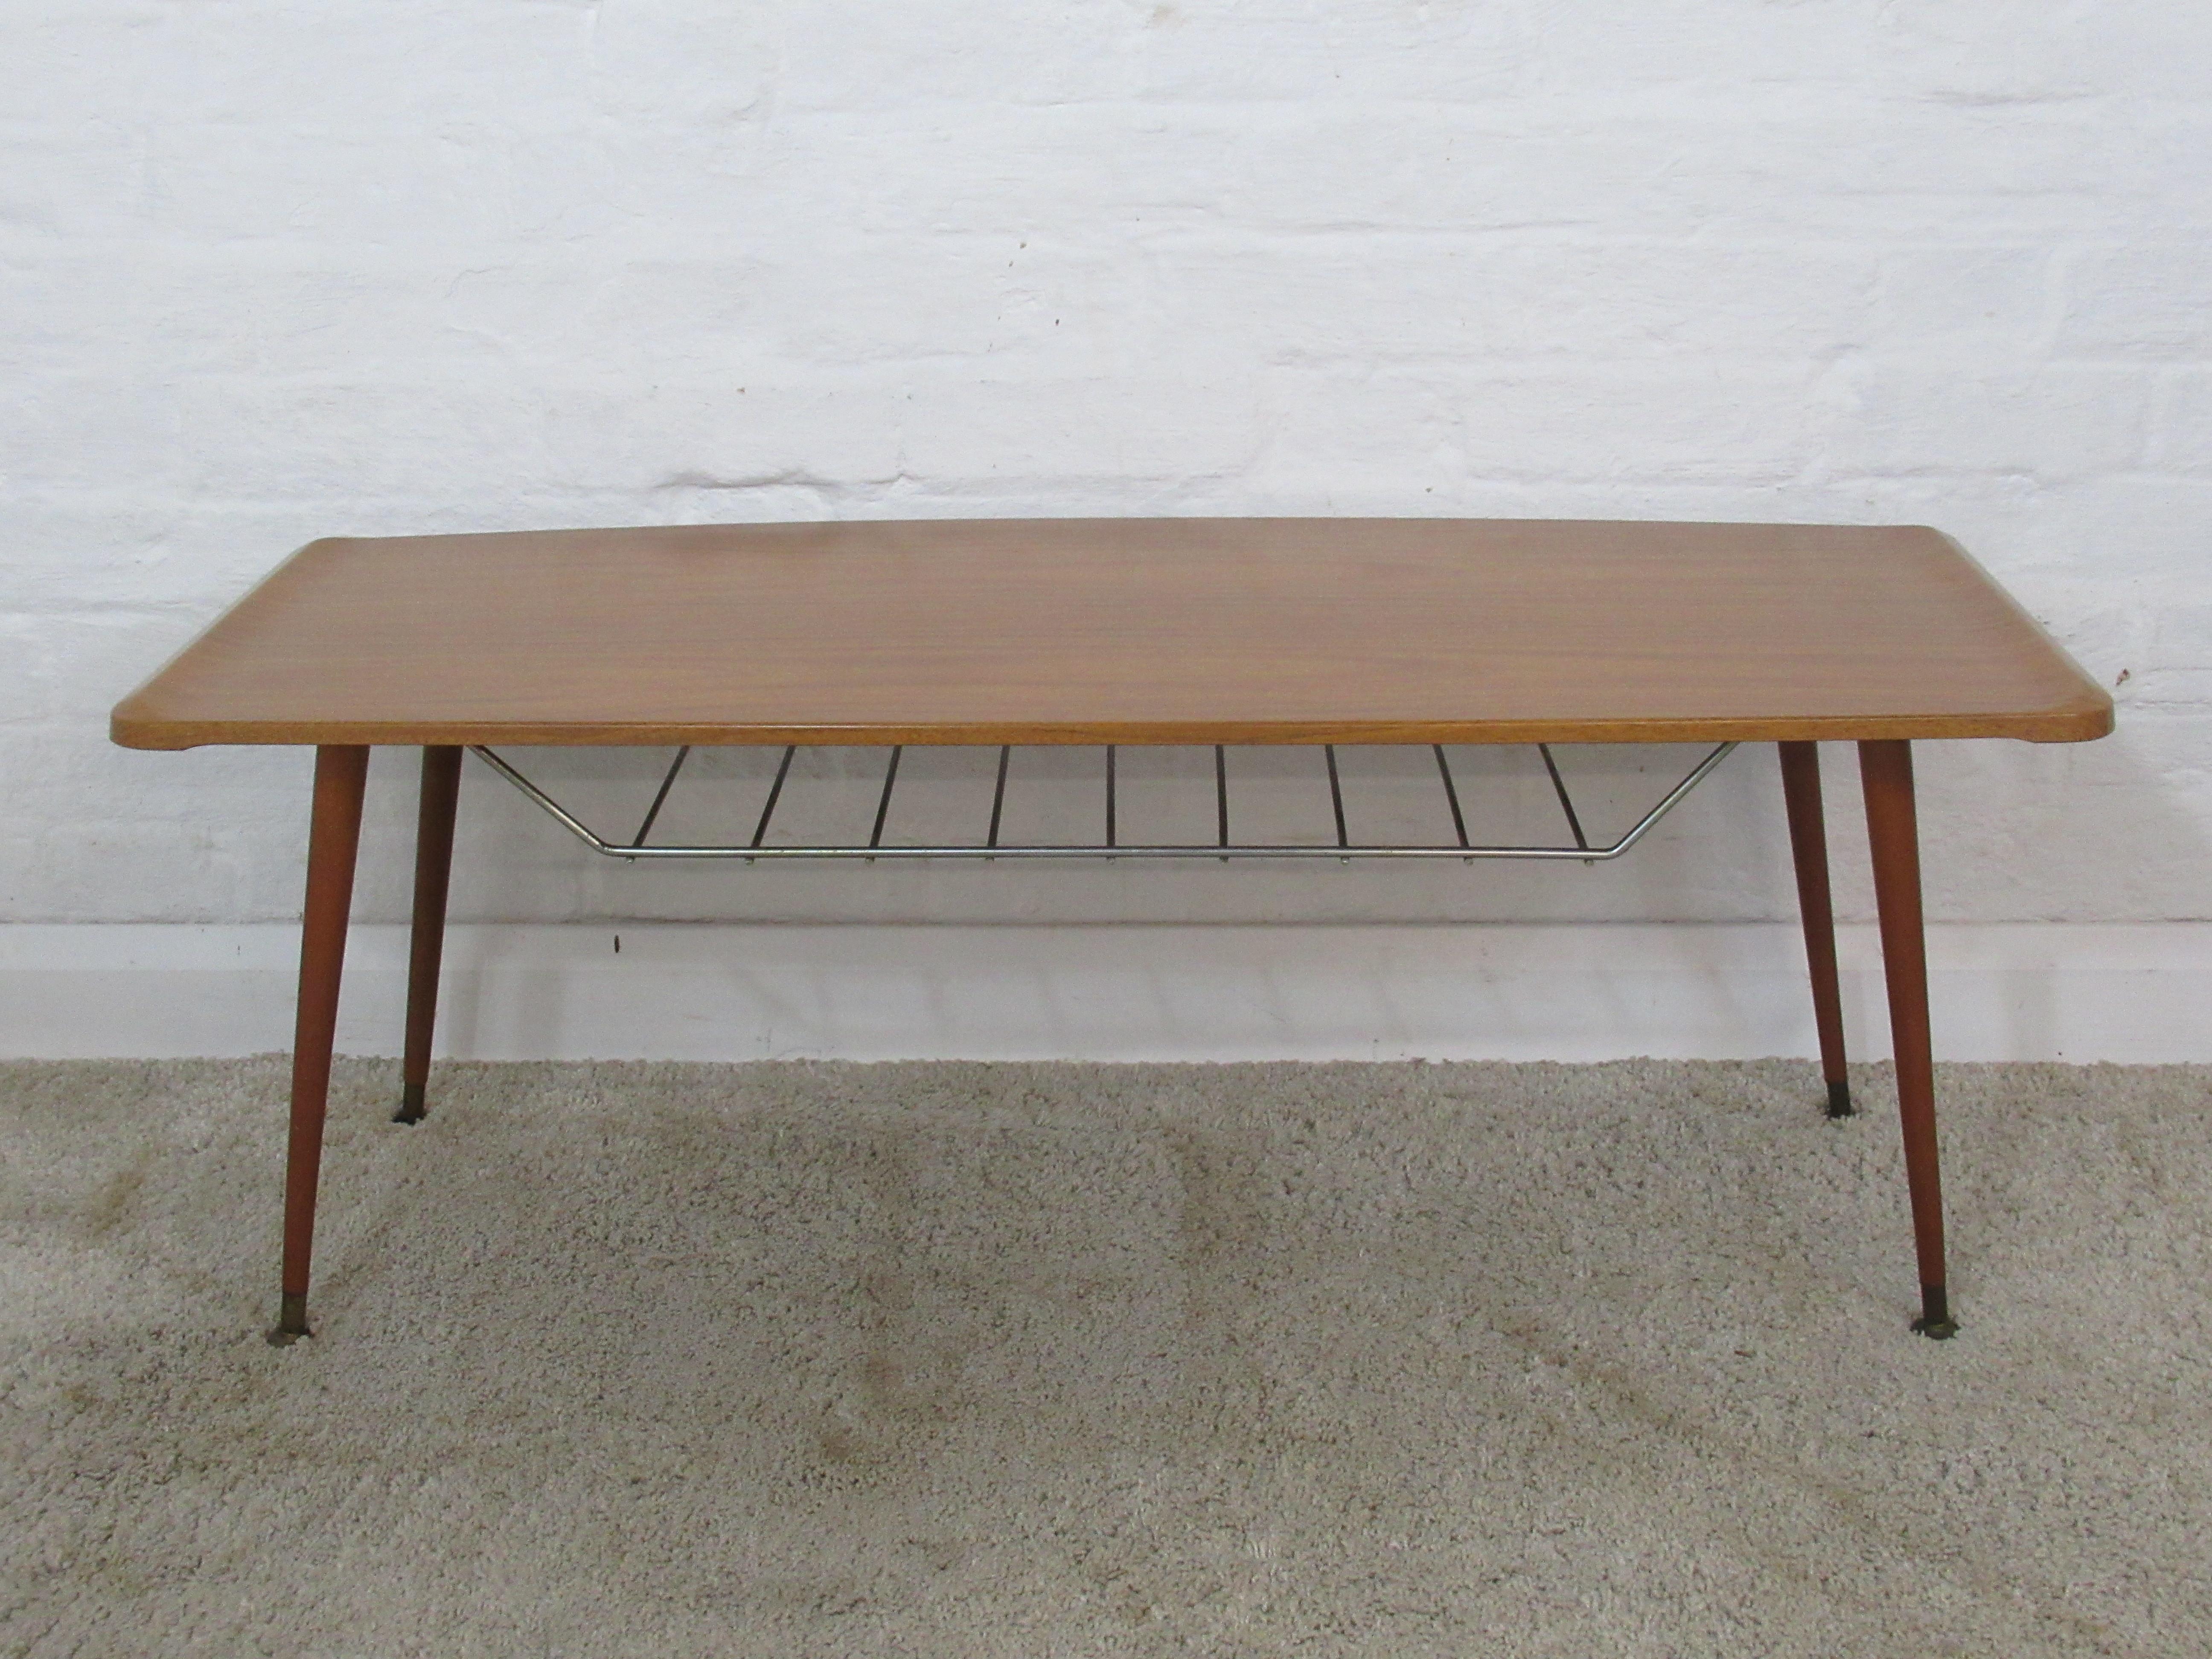 Retro Formwood Wood Effect Melamine Coffee Table With Suspended Metal  Undershelf